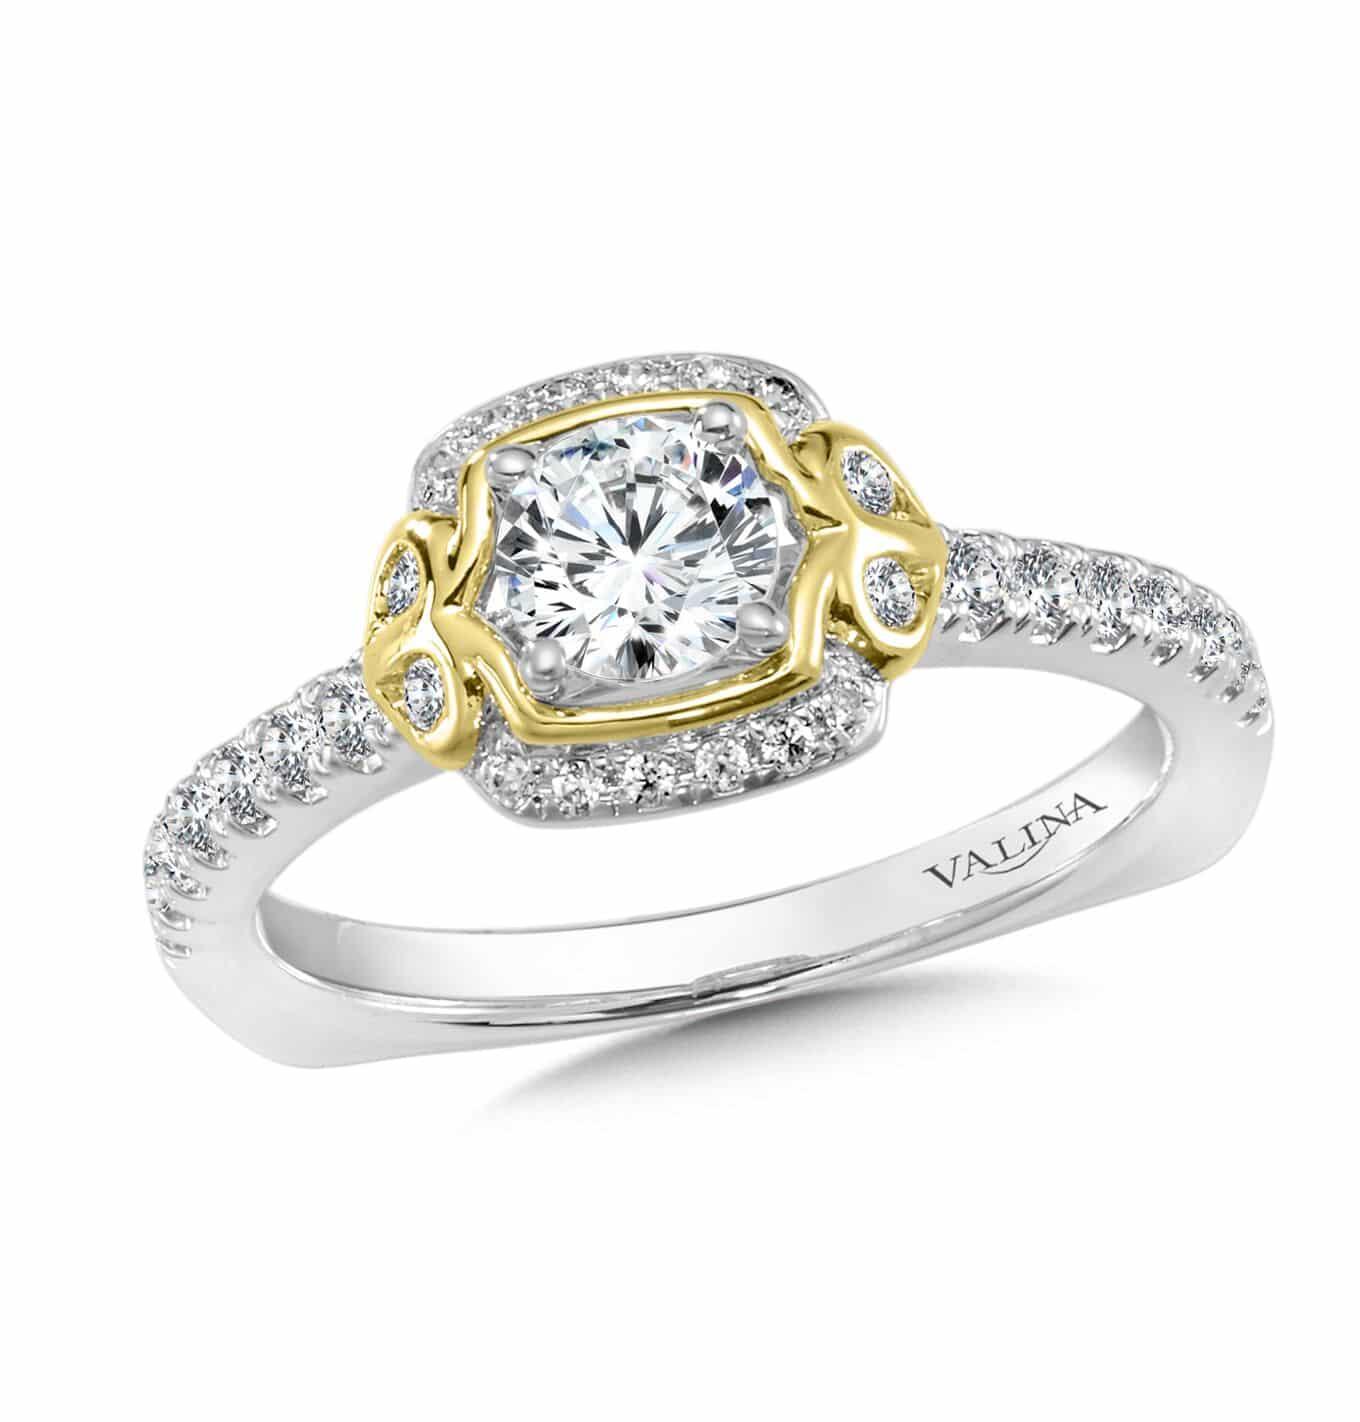 Custom Bezel Round Diamond Engagement Ring With A 1 Carat Halo Custom Design 3, Shira Diamonds